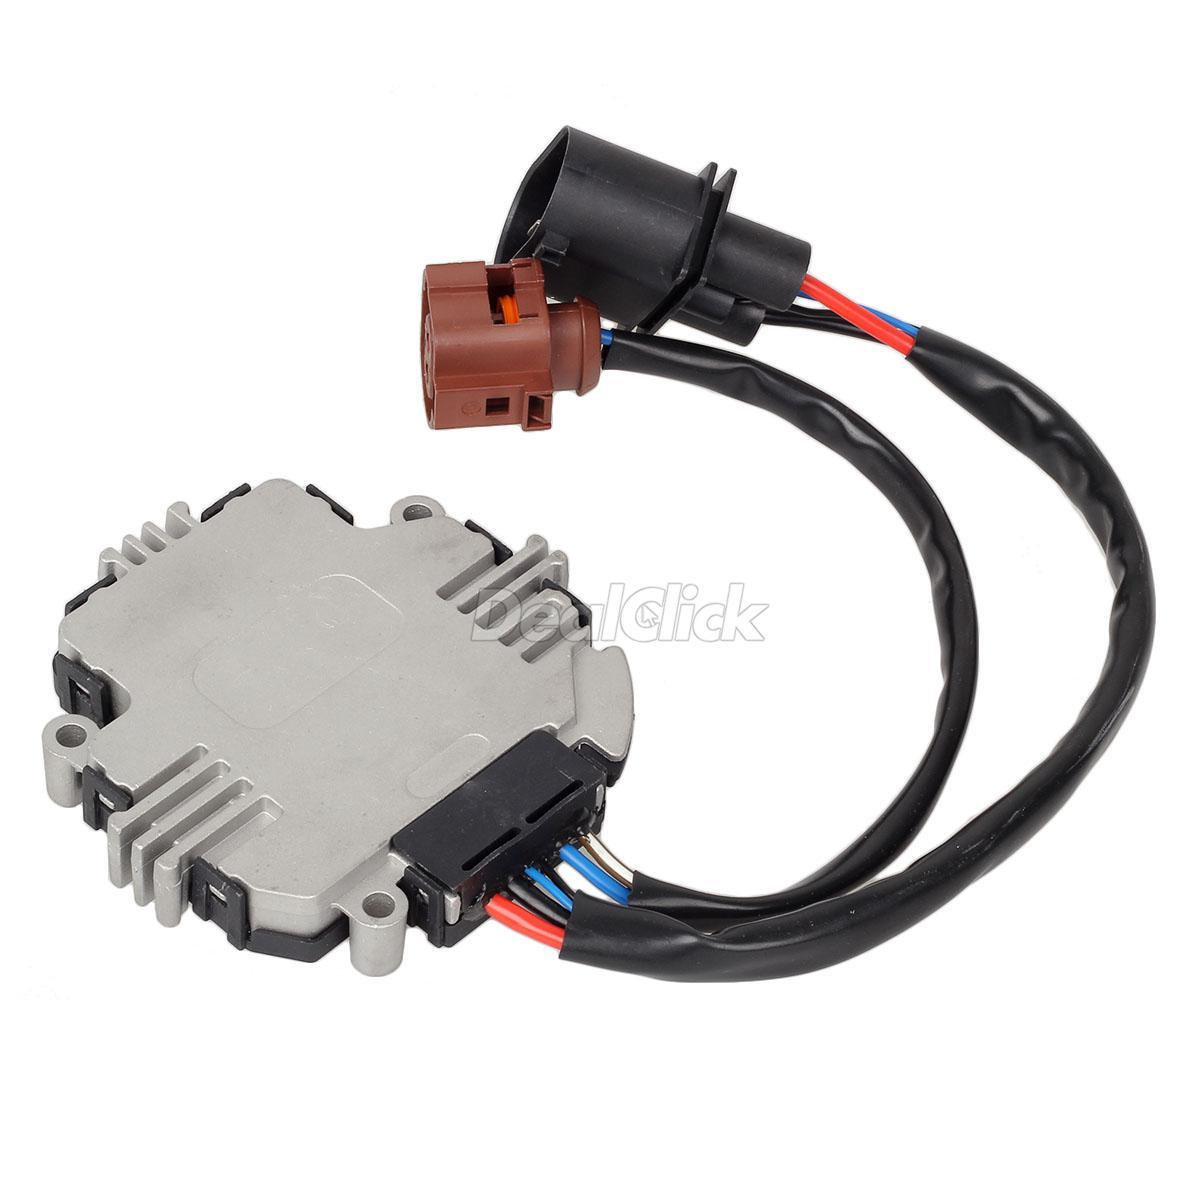 For Audi A3 Tt Vw Gti Golf Jetta Passat Radiator Cooling